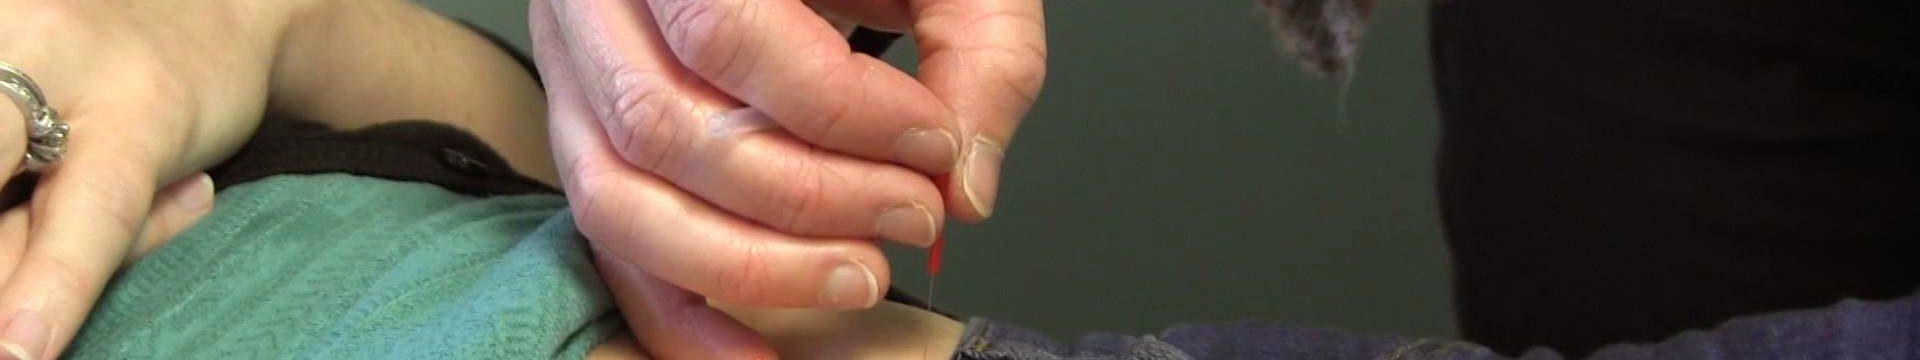 Acupuncture Treatment For Fertility